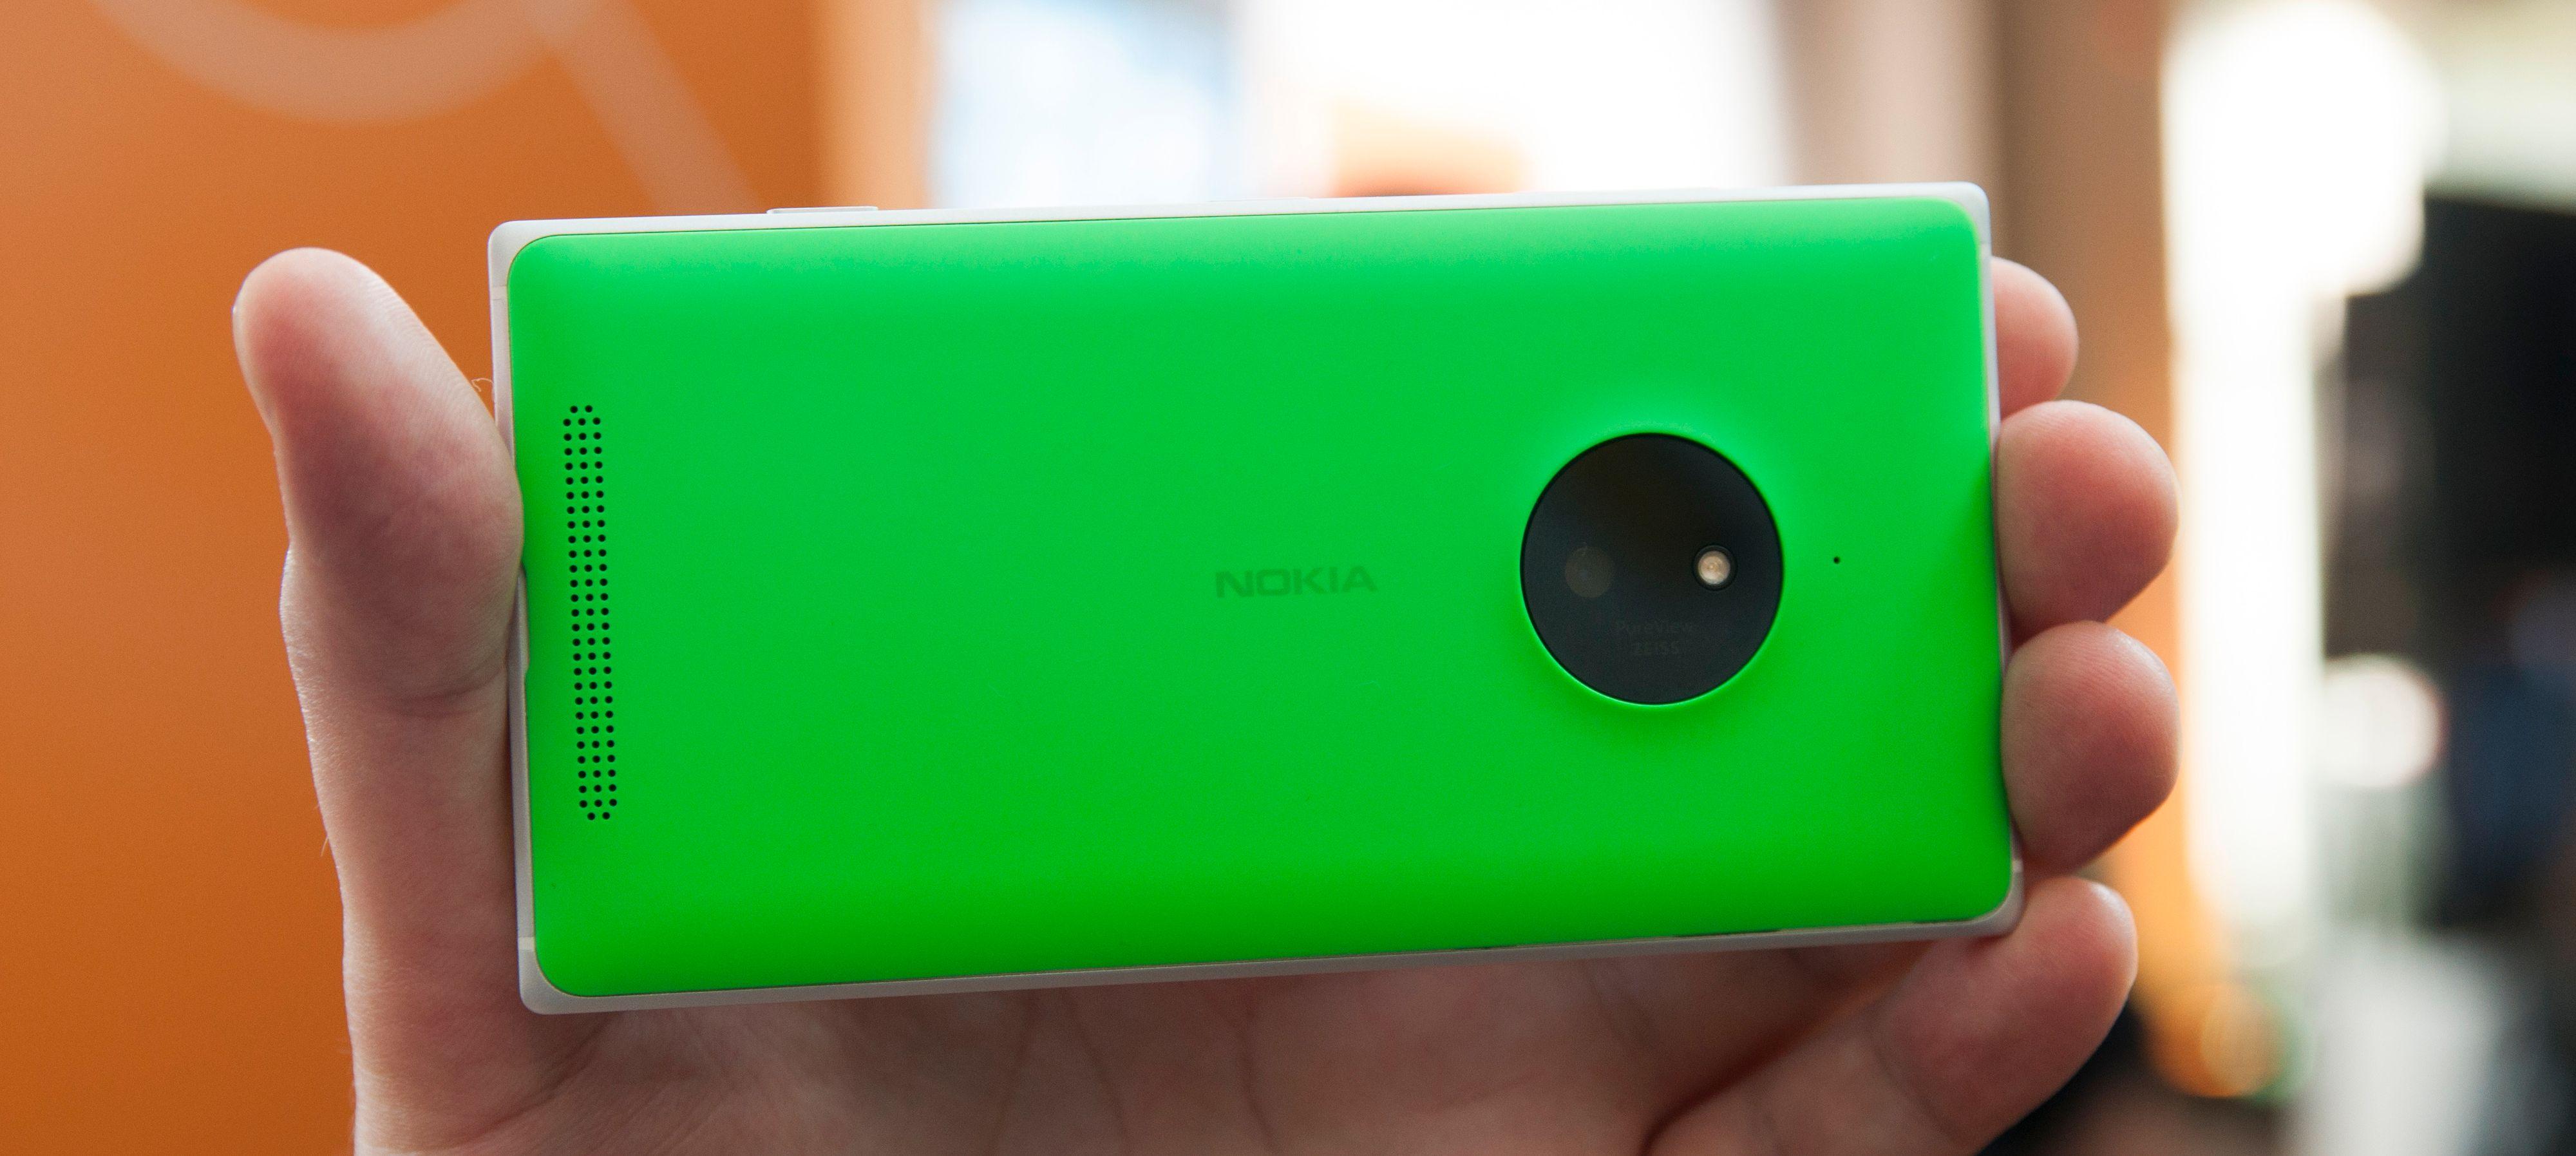 Lumia 830 skal være inngangsmodellen med optisk stabilisert PureView-kamera. Denne gang er oppløsningen bare på 10 megapiksler.Foto: Finn Jarle Kvaheim, Amobil.no